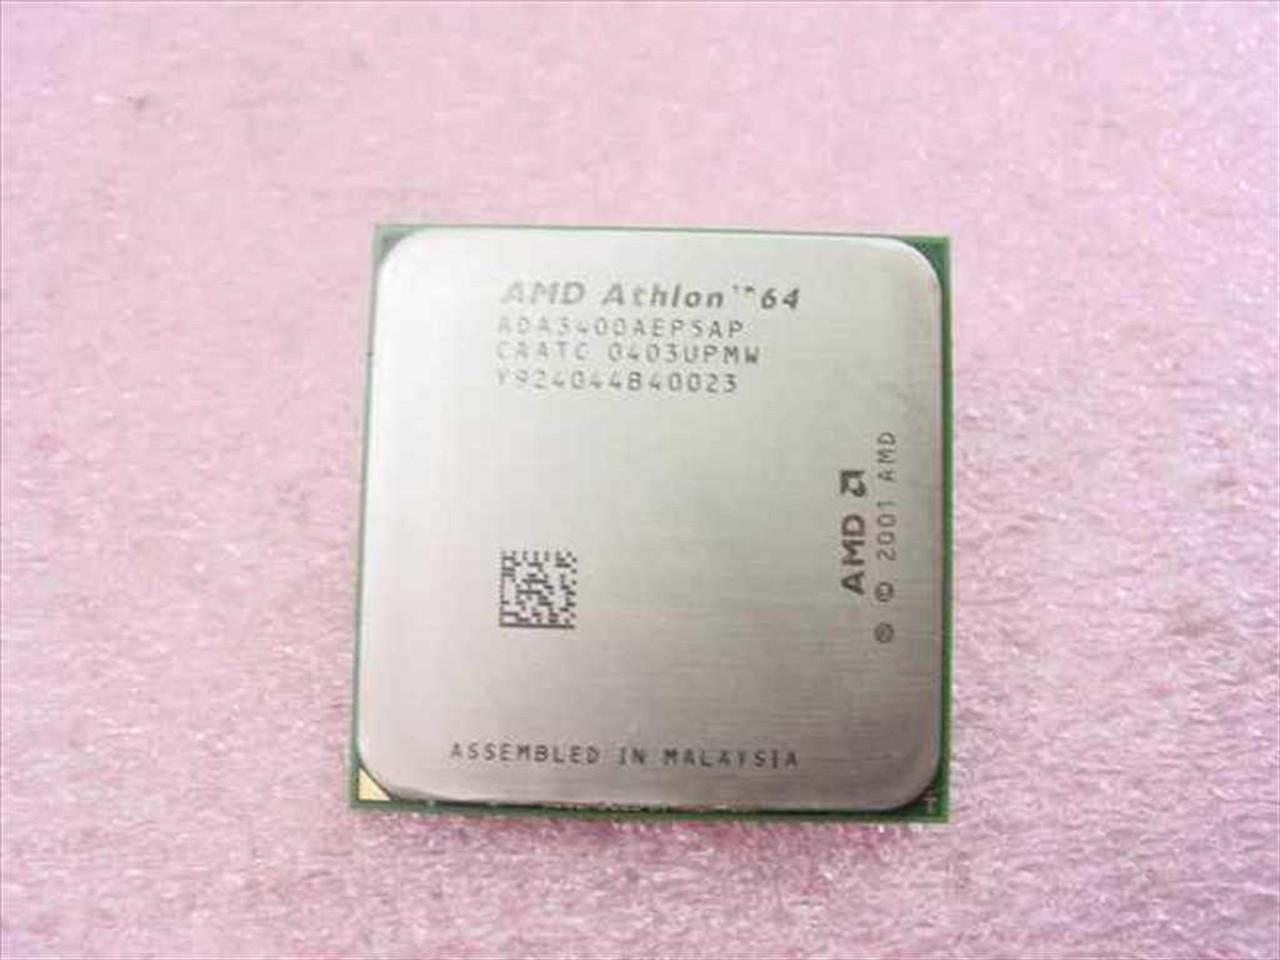 Amd Ada3400aep5ap Athlon 64 Processor 3400 2 2ghz 2000 1024 1 5v Recycledgoods Com